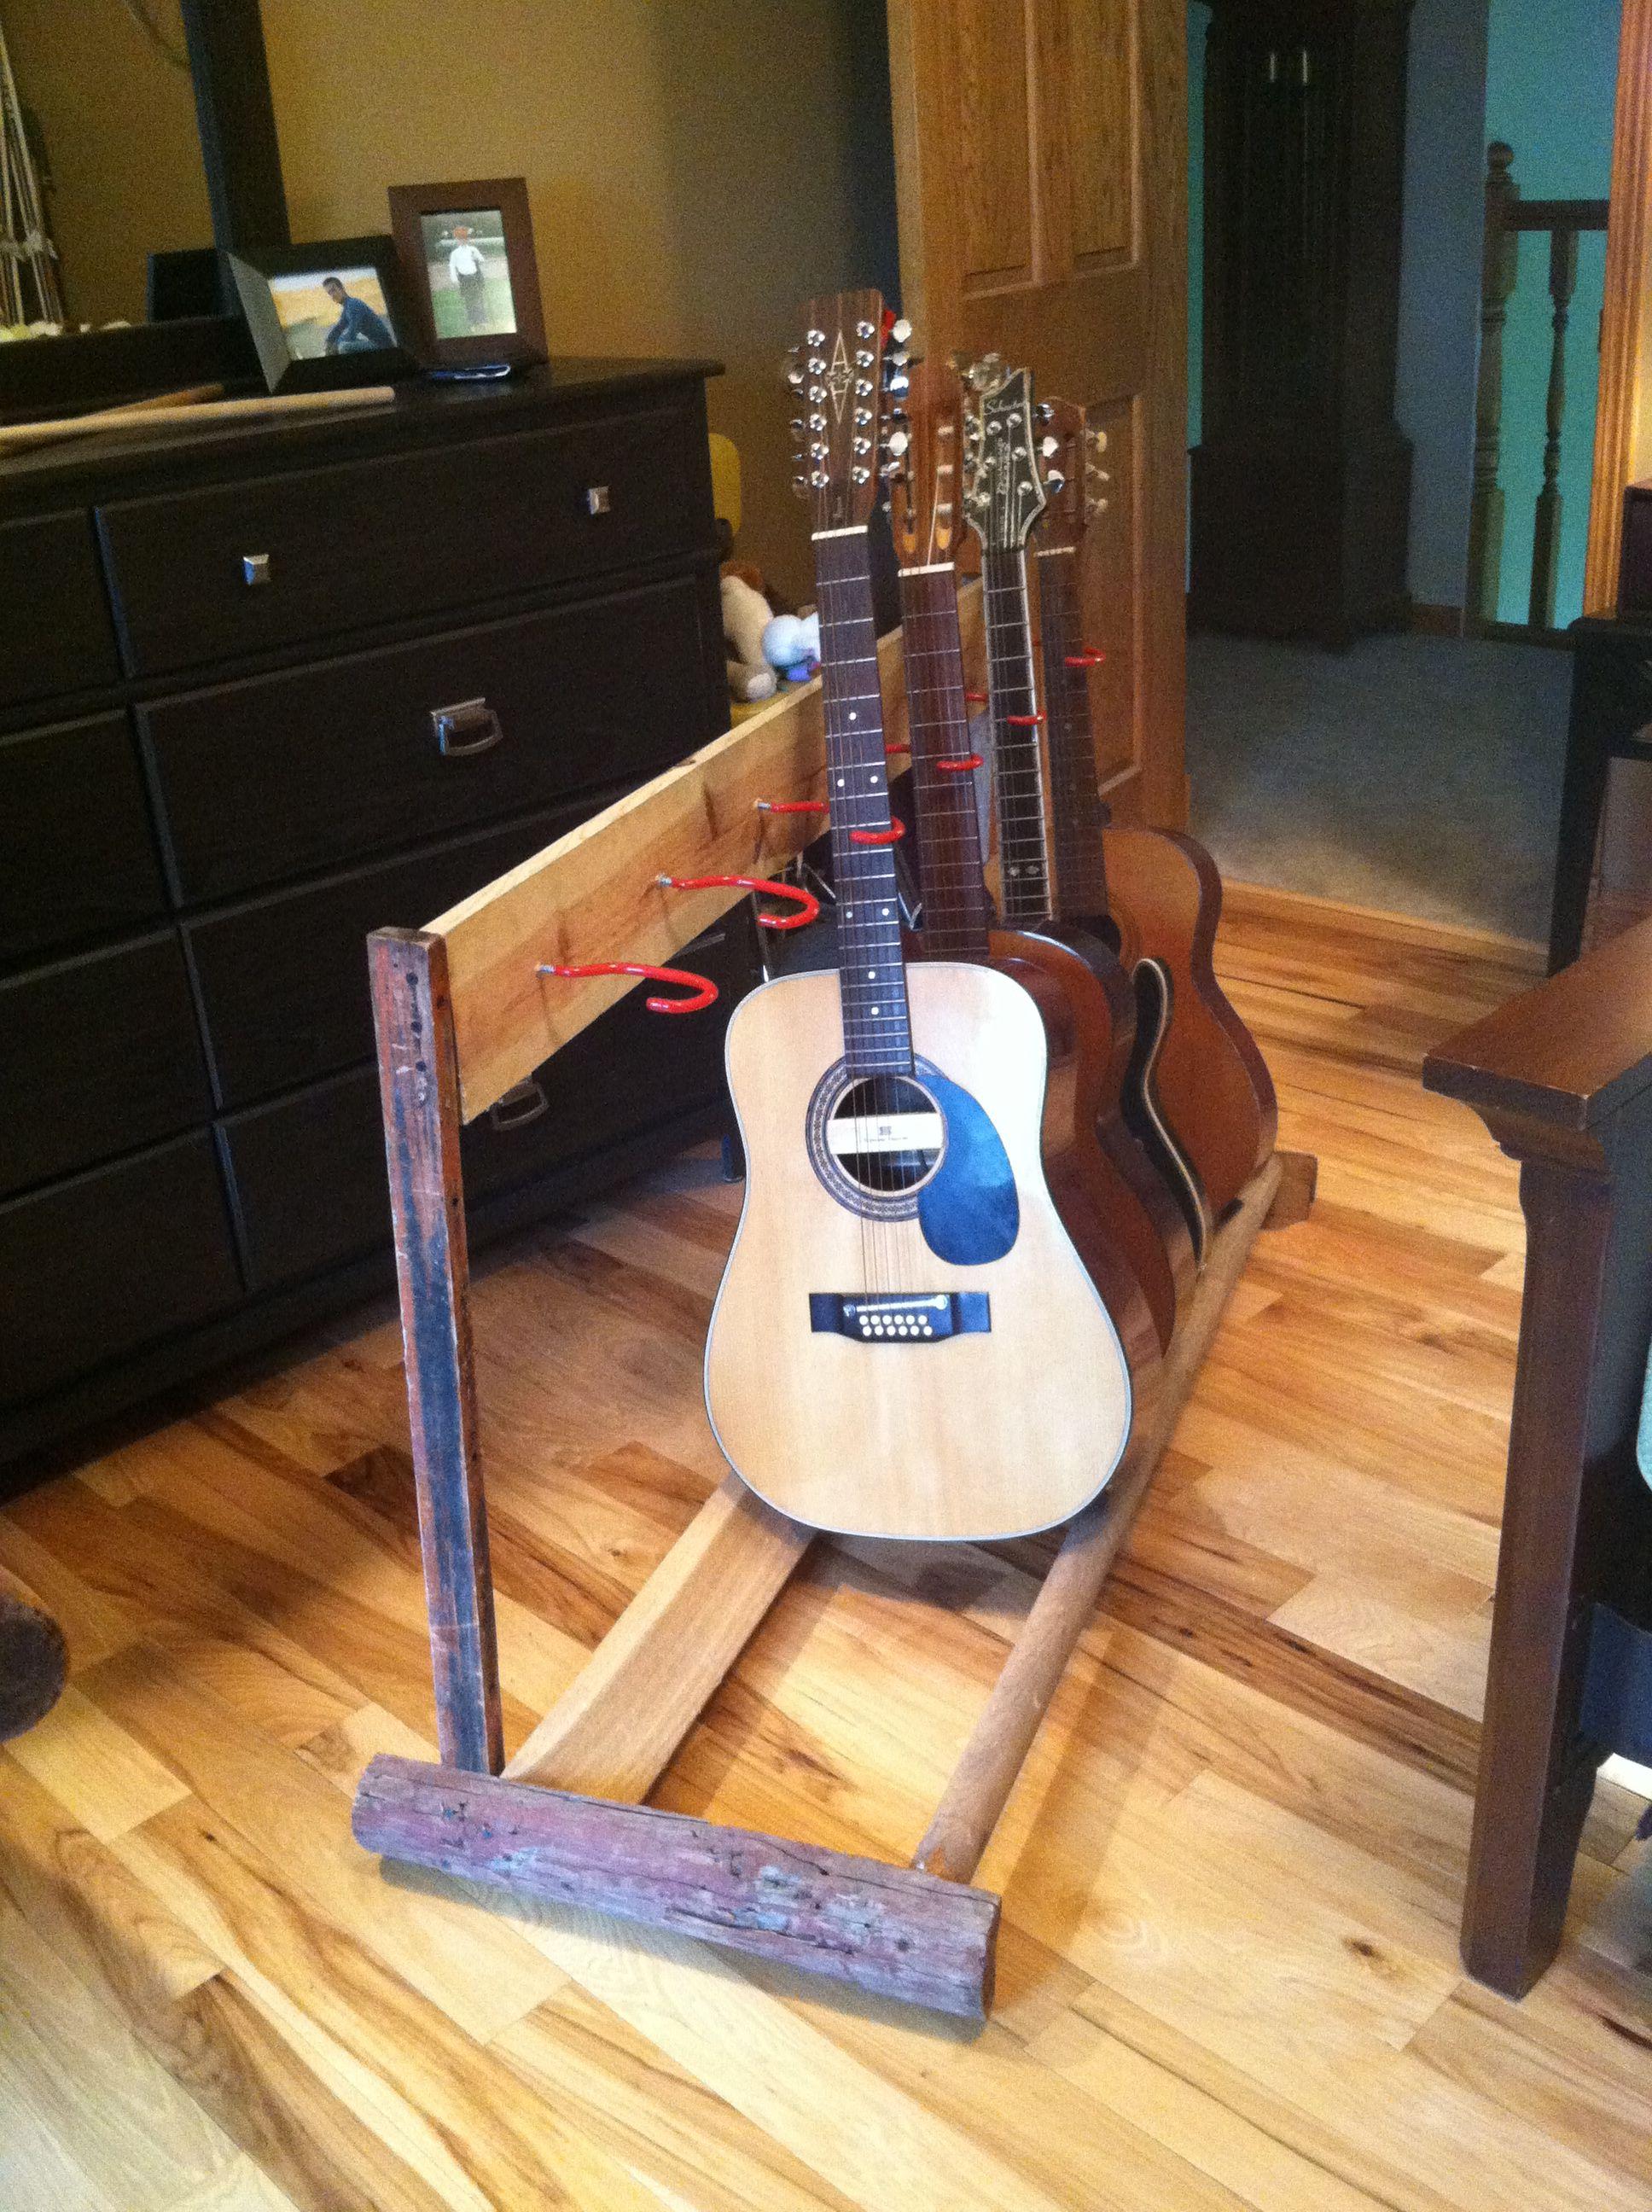 diy guitar stand oldbarnwood diy and good ideas in 2019 diy guitar stand guitar display. Black Bedroom Furniture Sets. Home Design Ideas